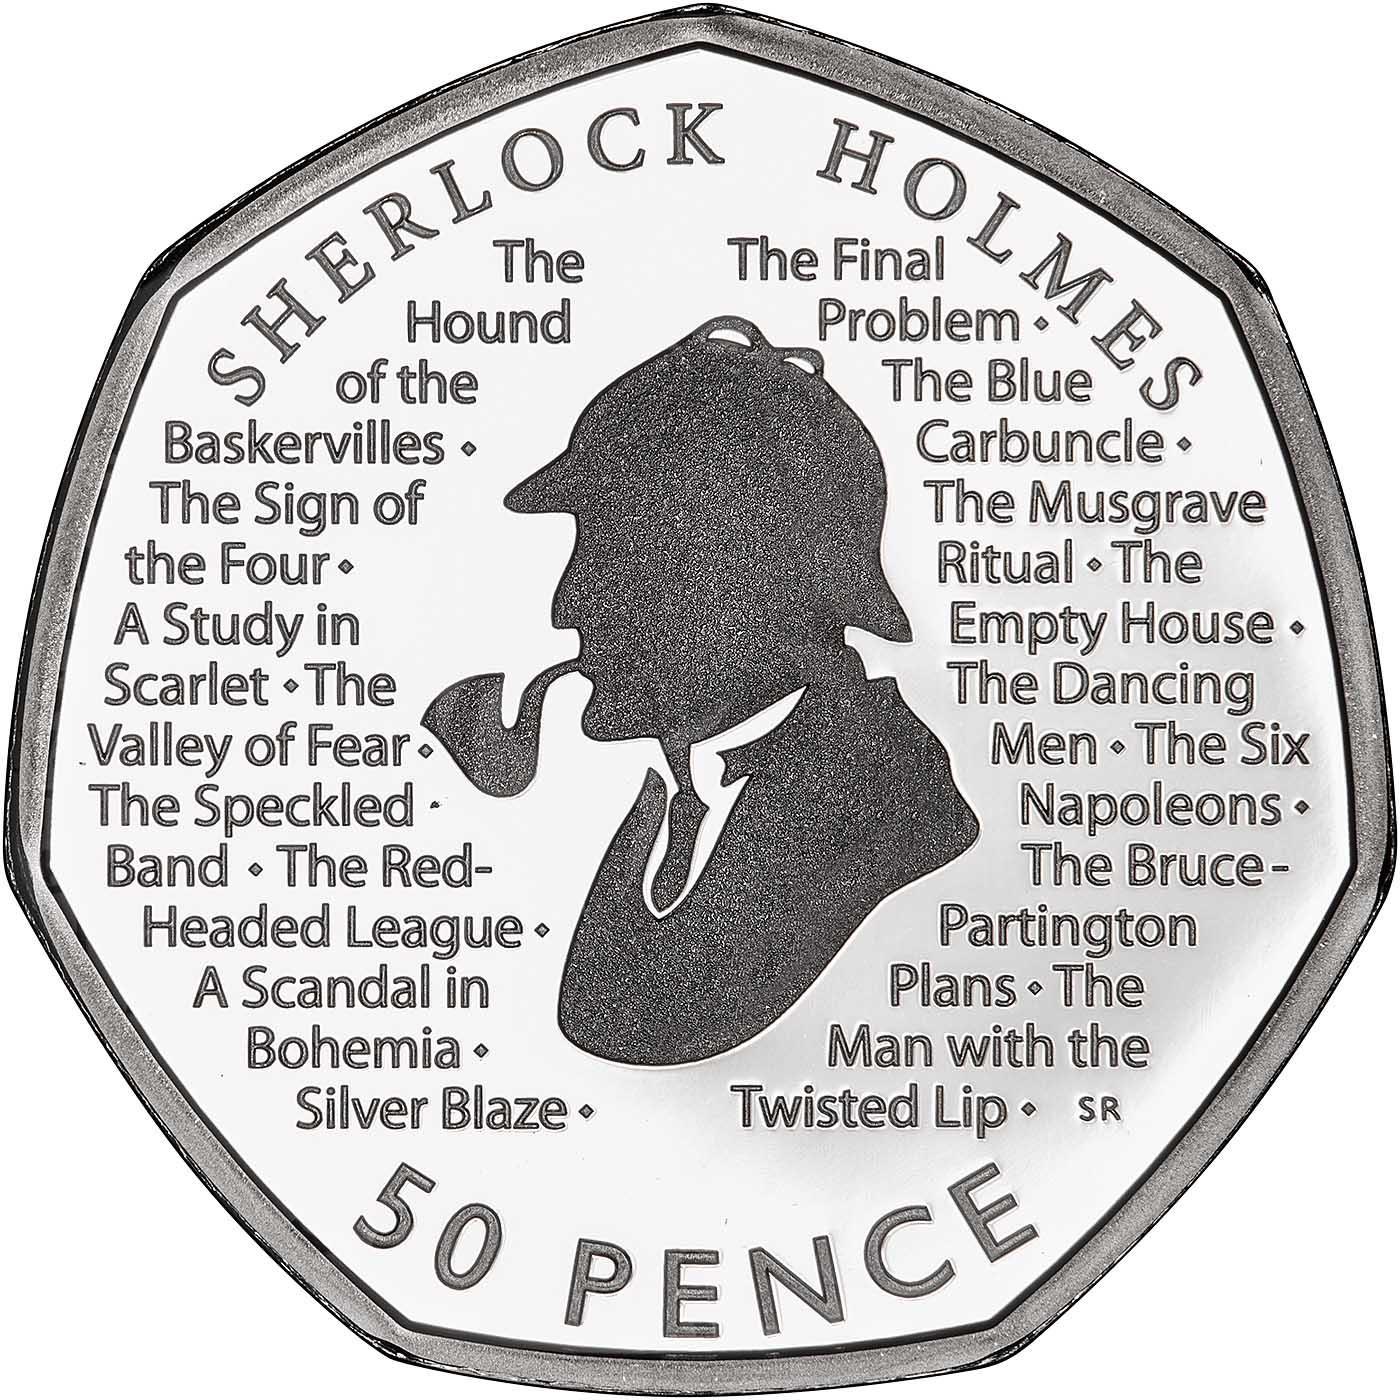 Sherlock holmes 50p coin